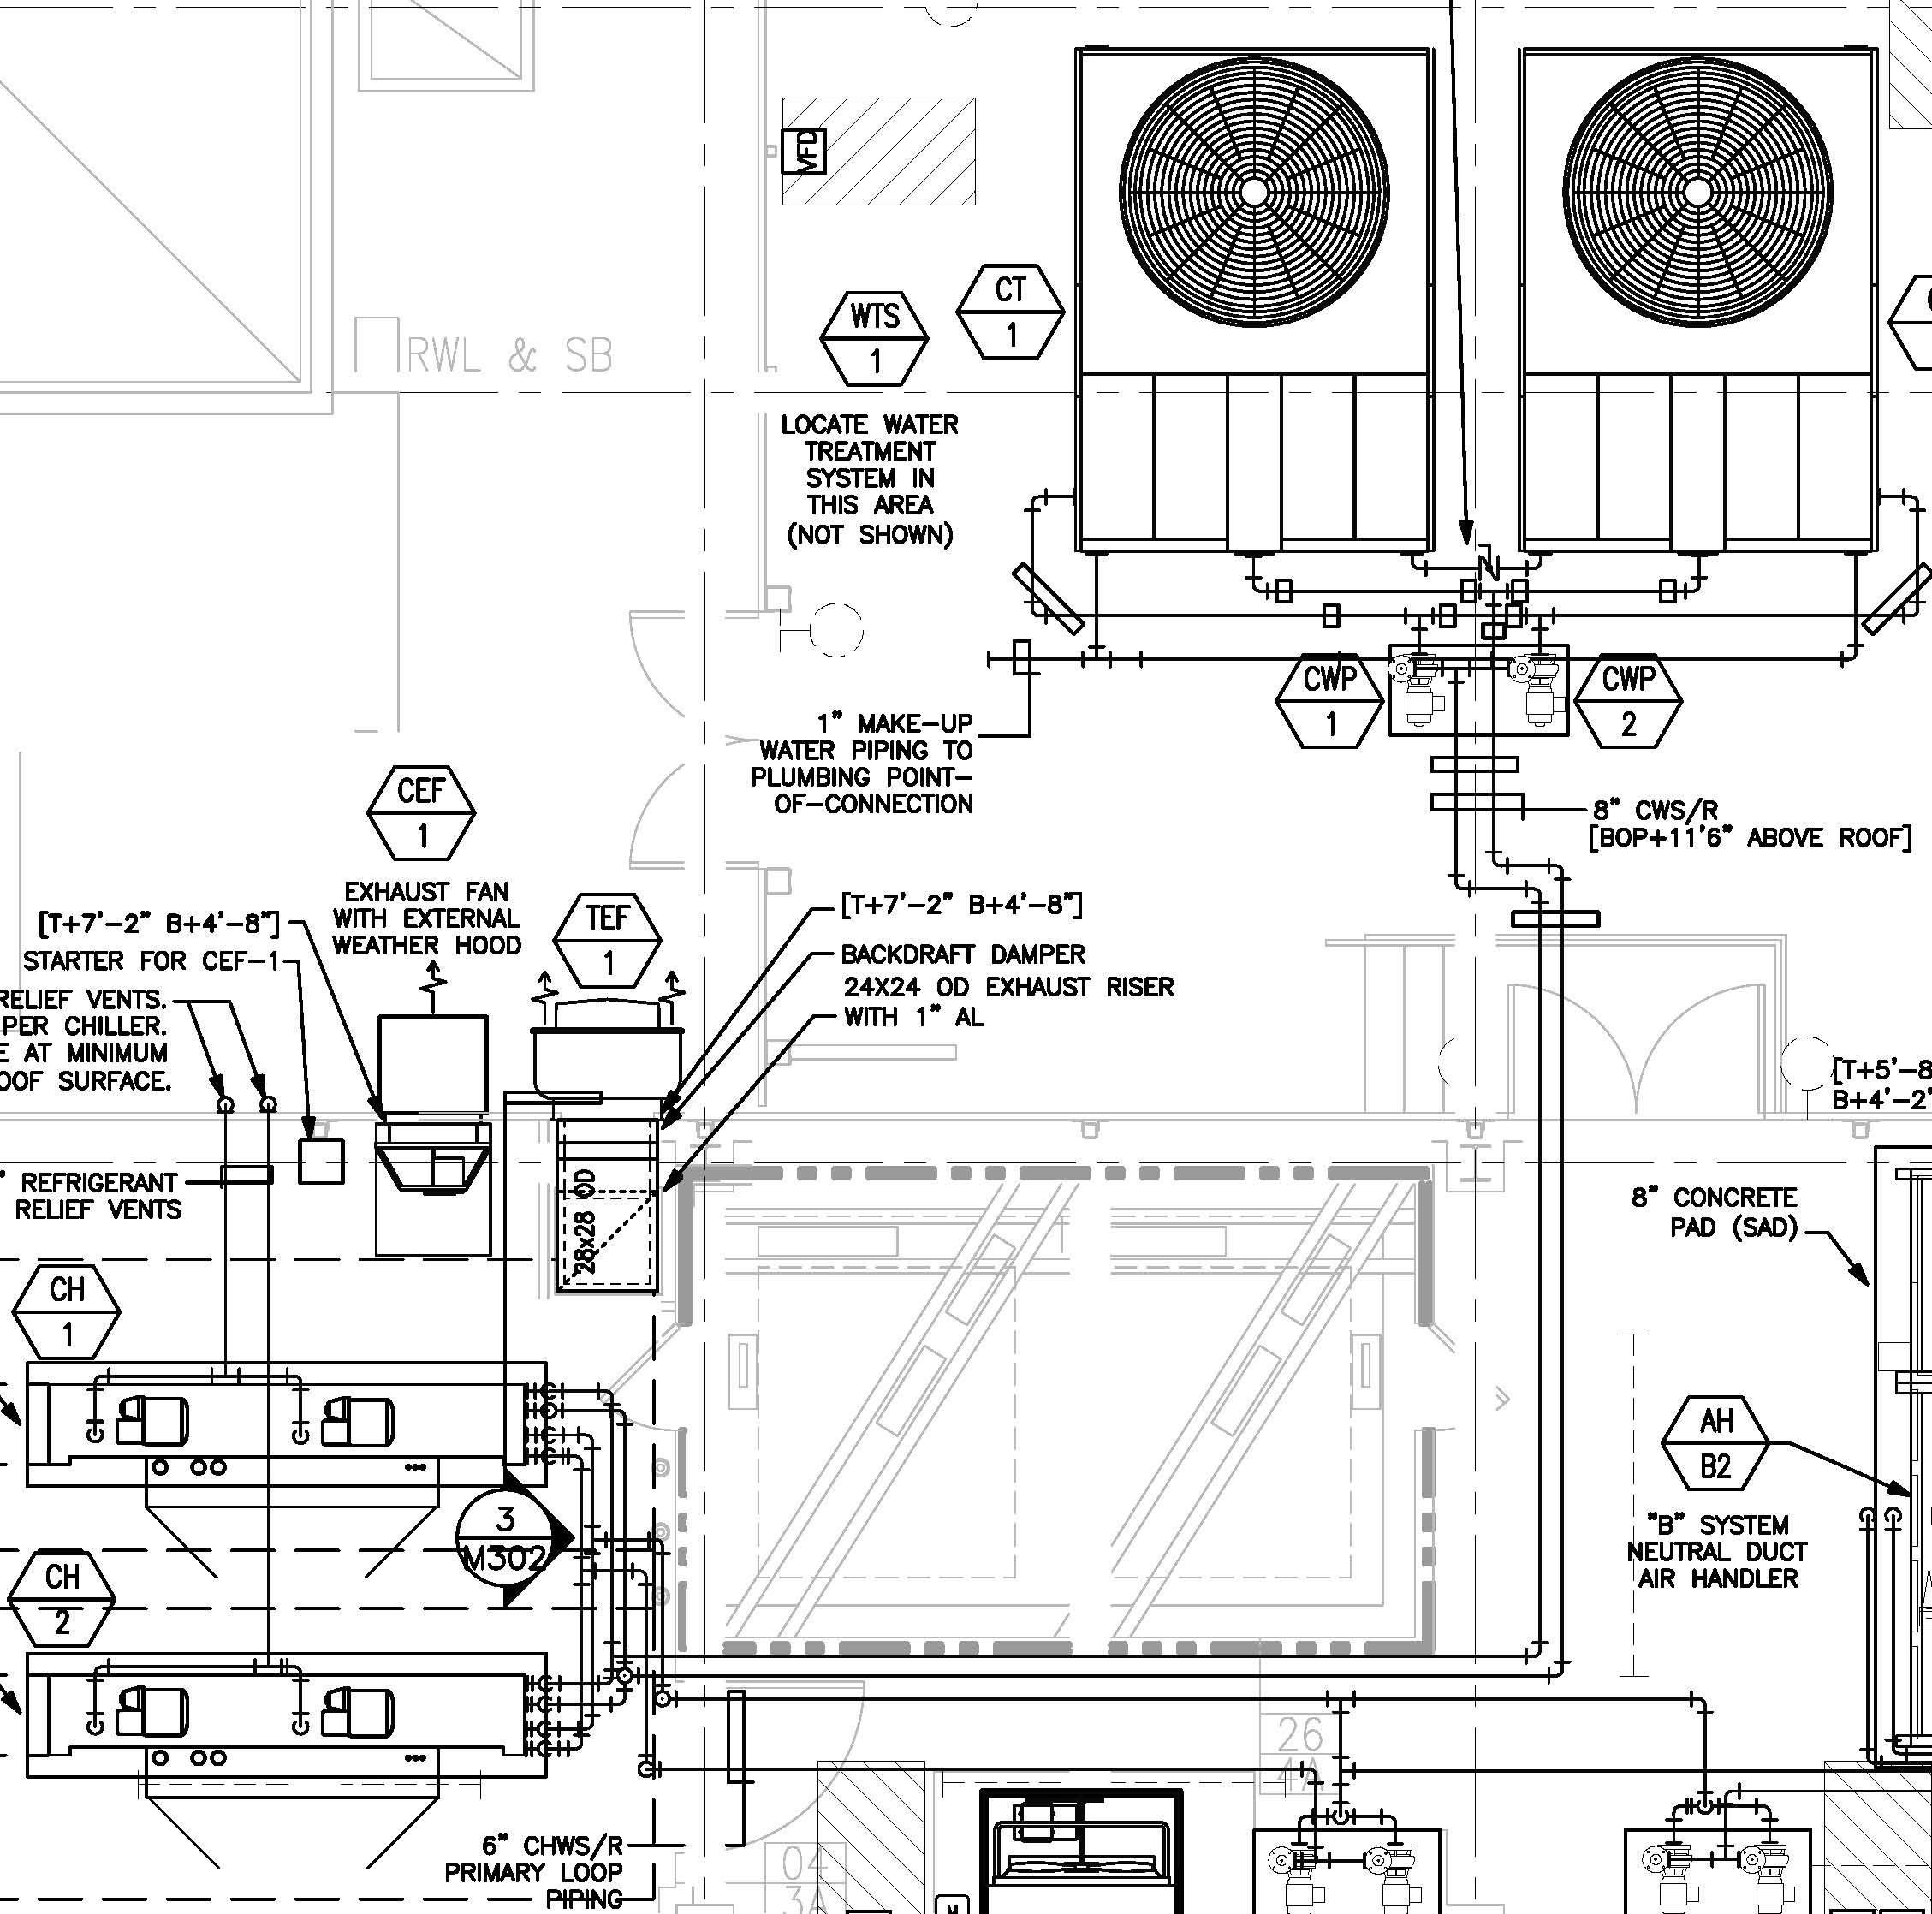 2002 toyota Sienna Engine Diagram toyota Fuse Box Circuit Automotive Wiring Diagrams Of 2002 toyota Sienna Engine Diagram